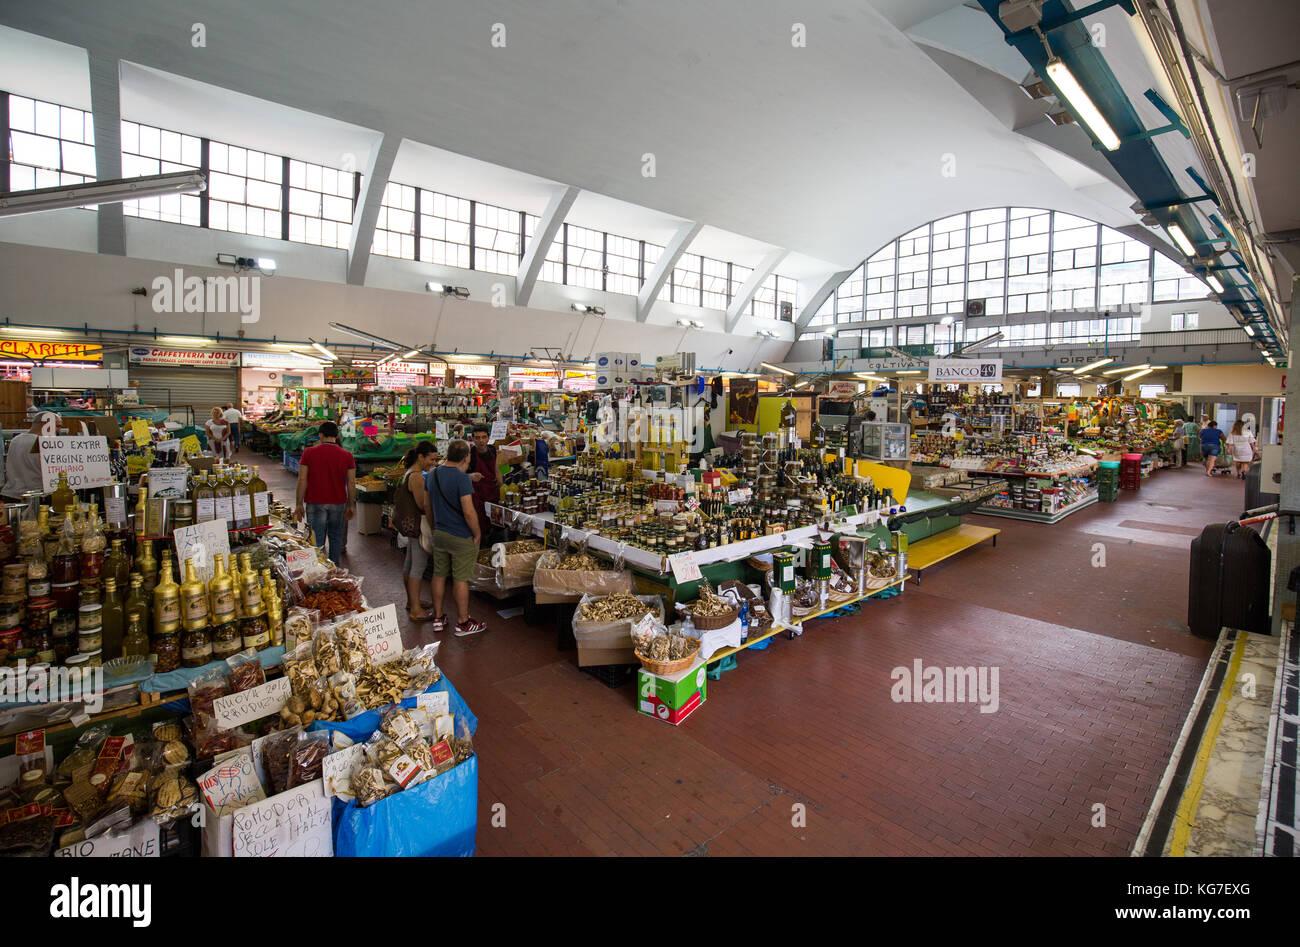 Tourist shopping at Mercato Annonario indoor market, San Remo, Italy. - Stock Image